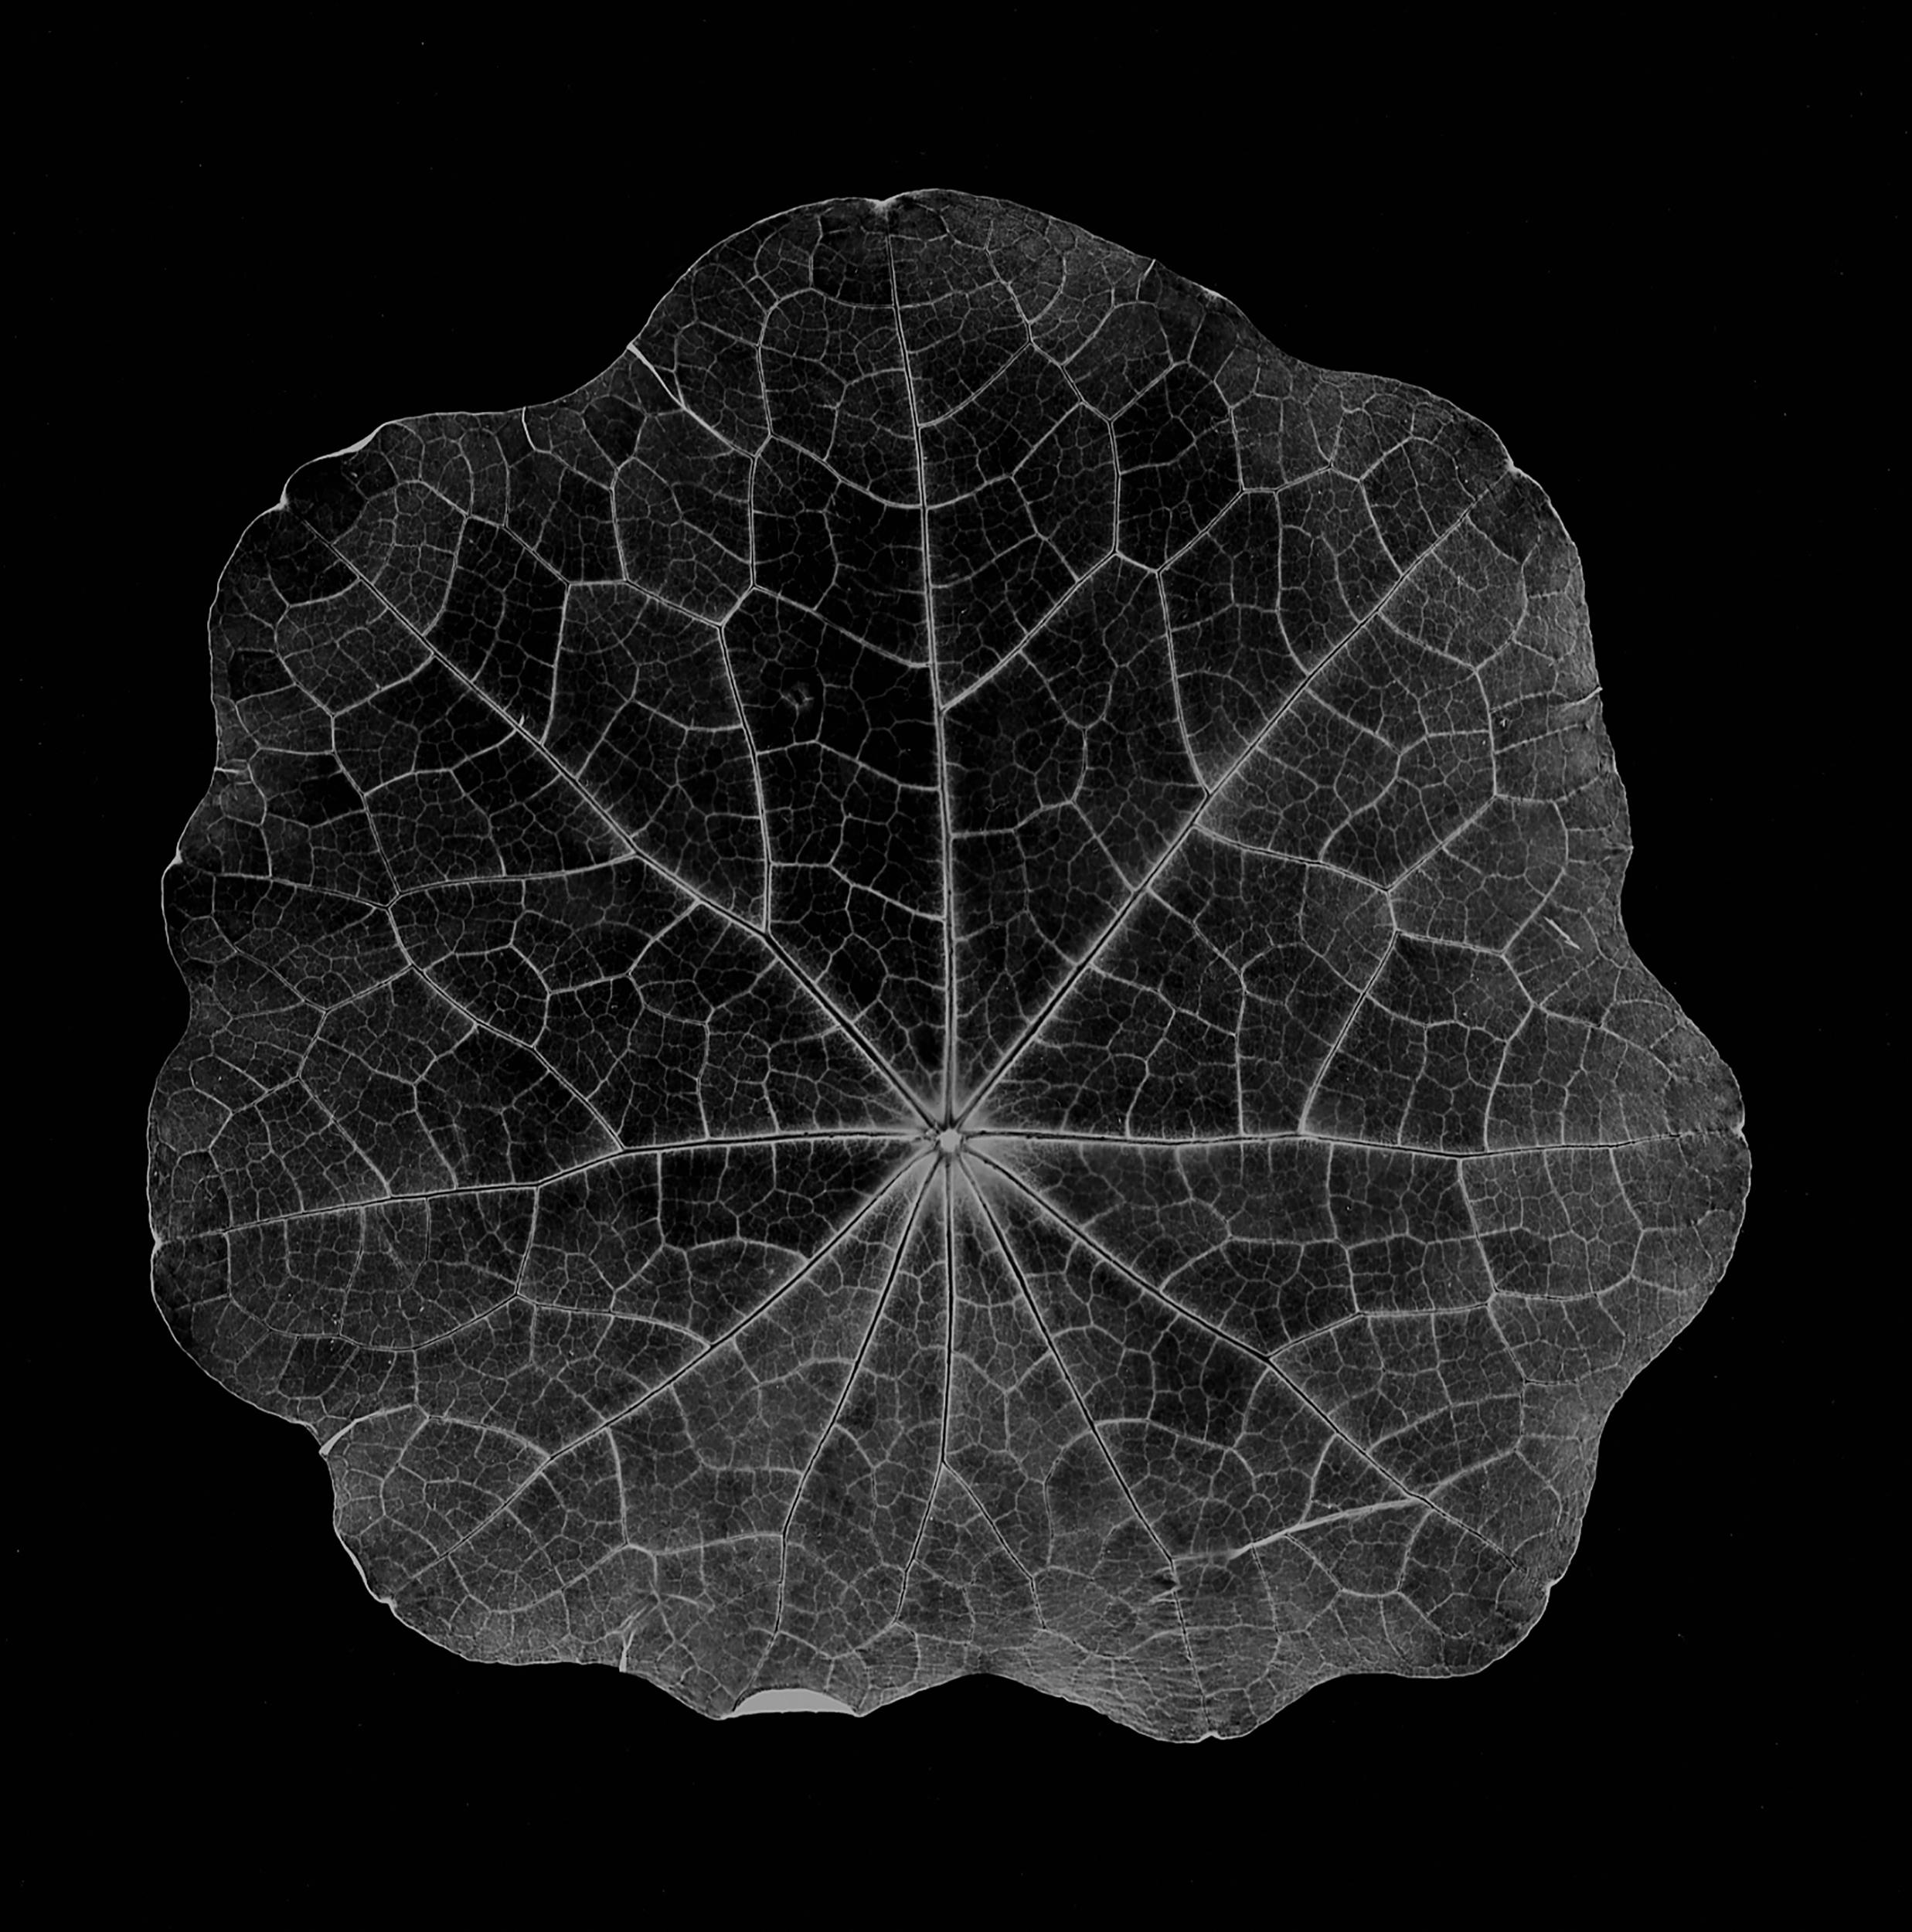 nasturtium leaf, 2001 gold-toned sunprint